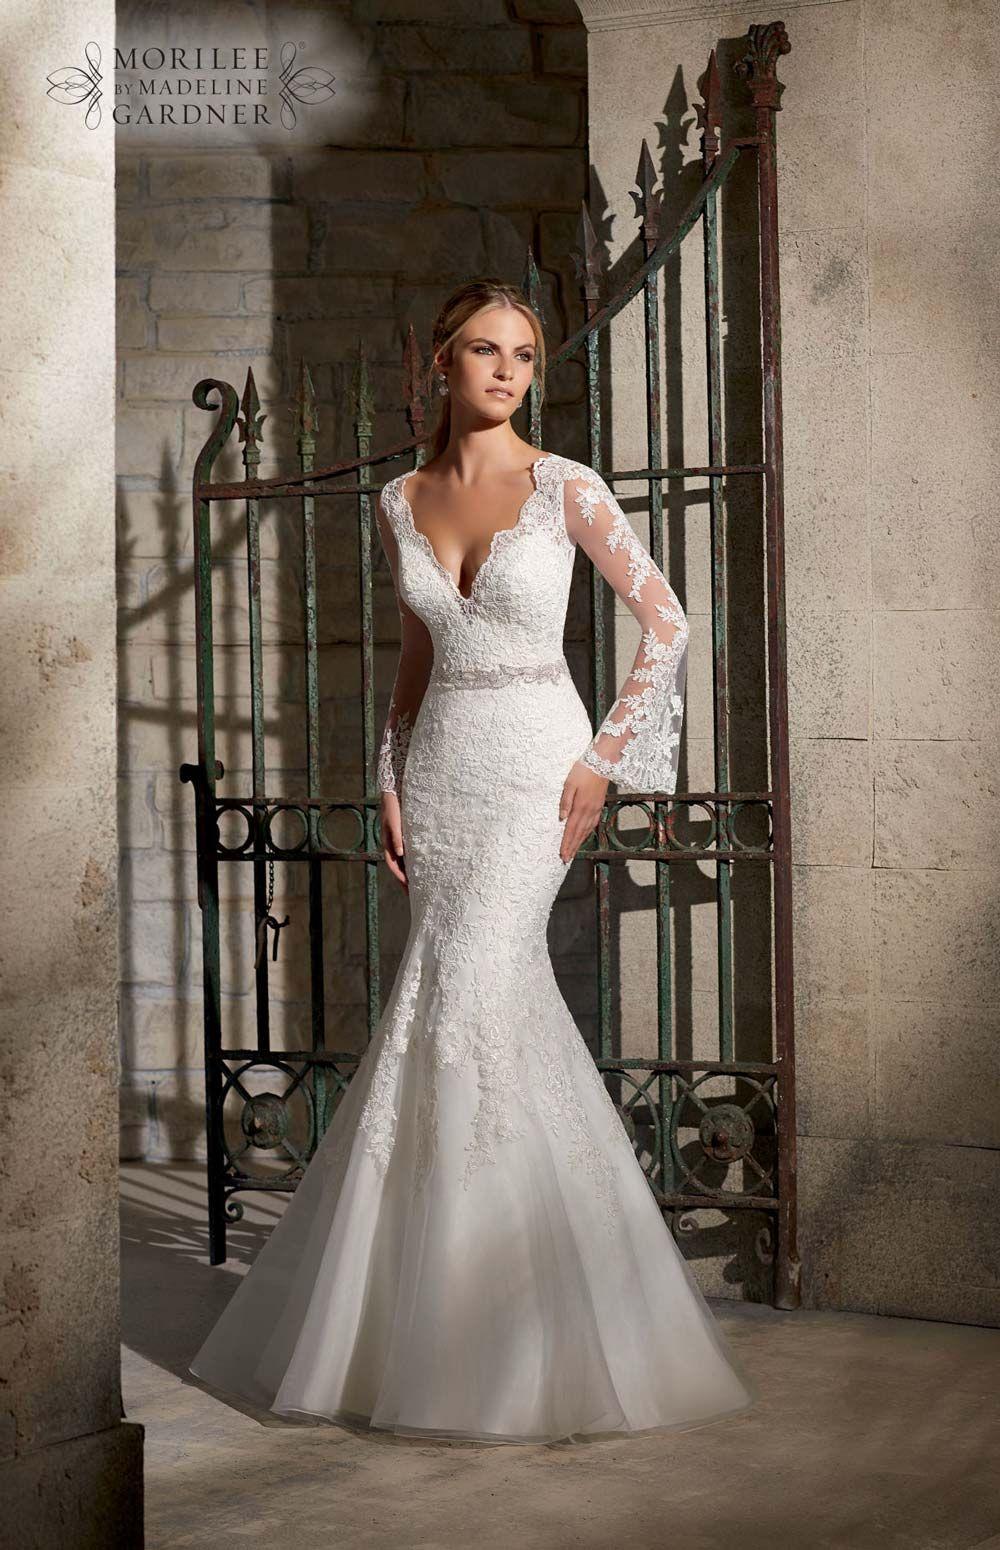 Pin On Wedding Dresses [ 1550 x 1000 Pixel ]